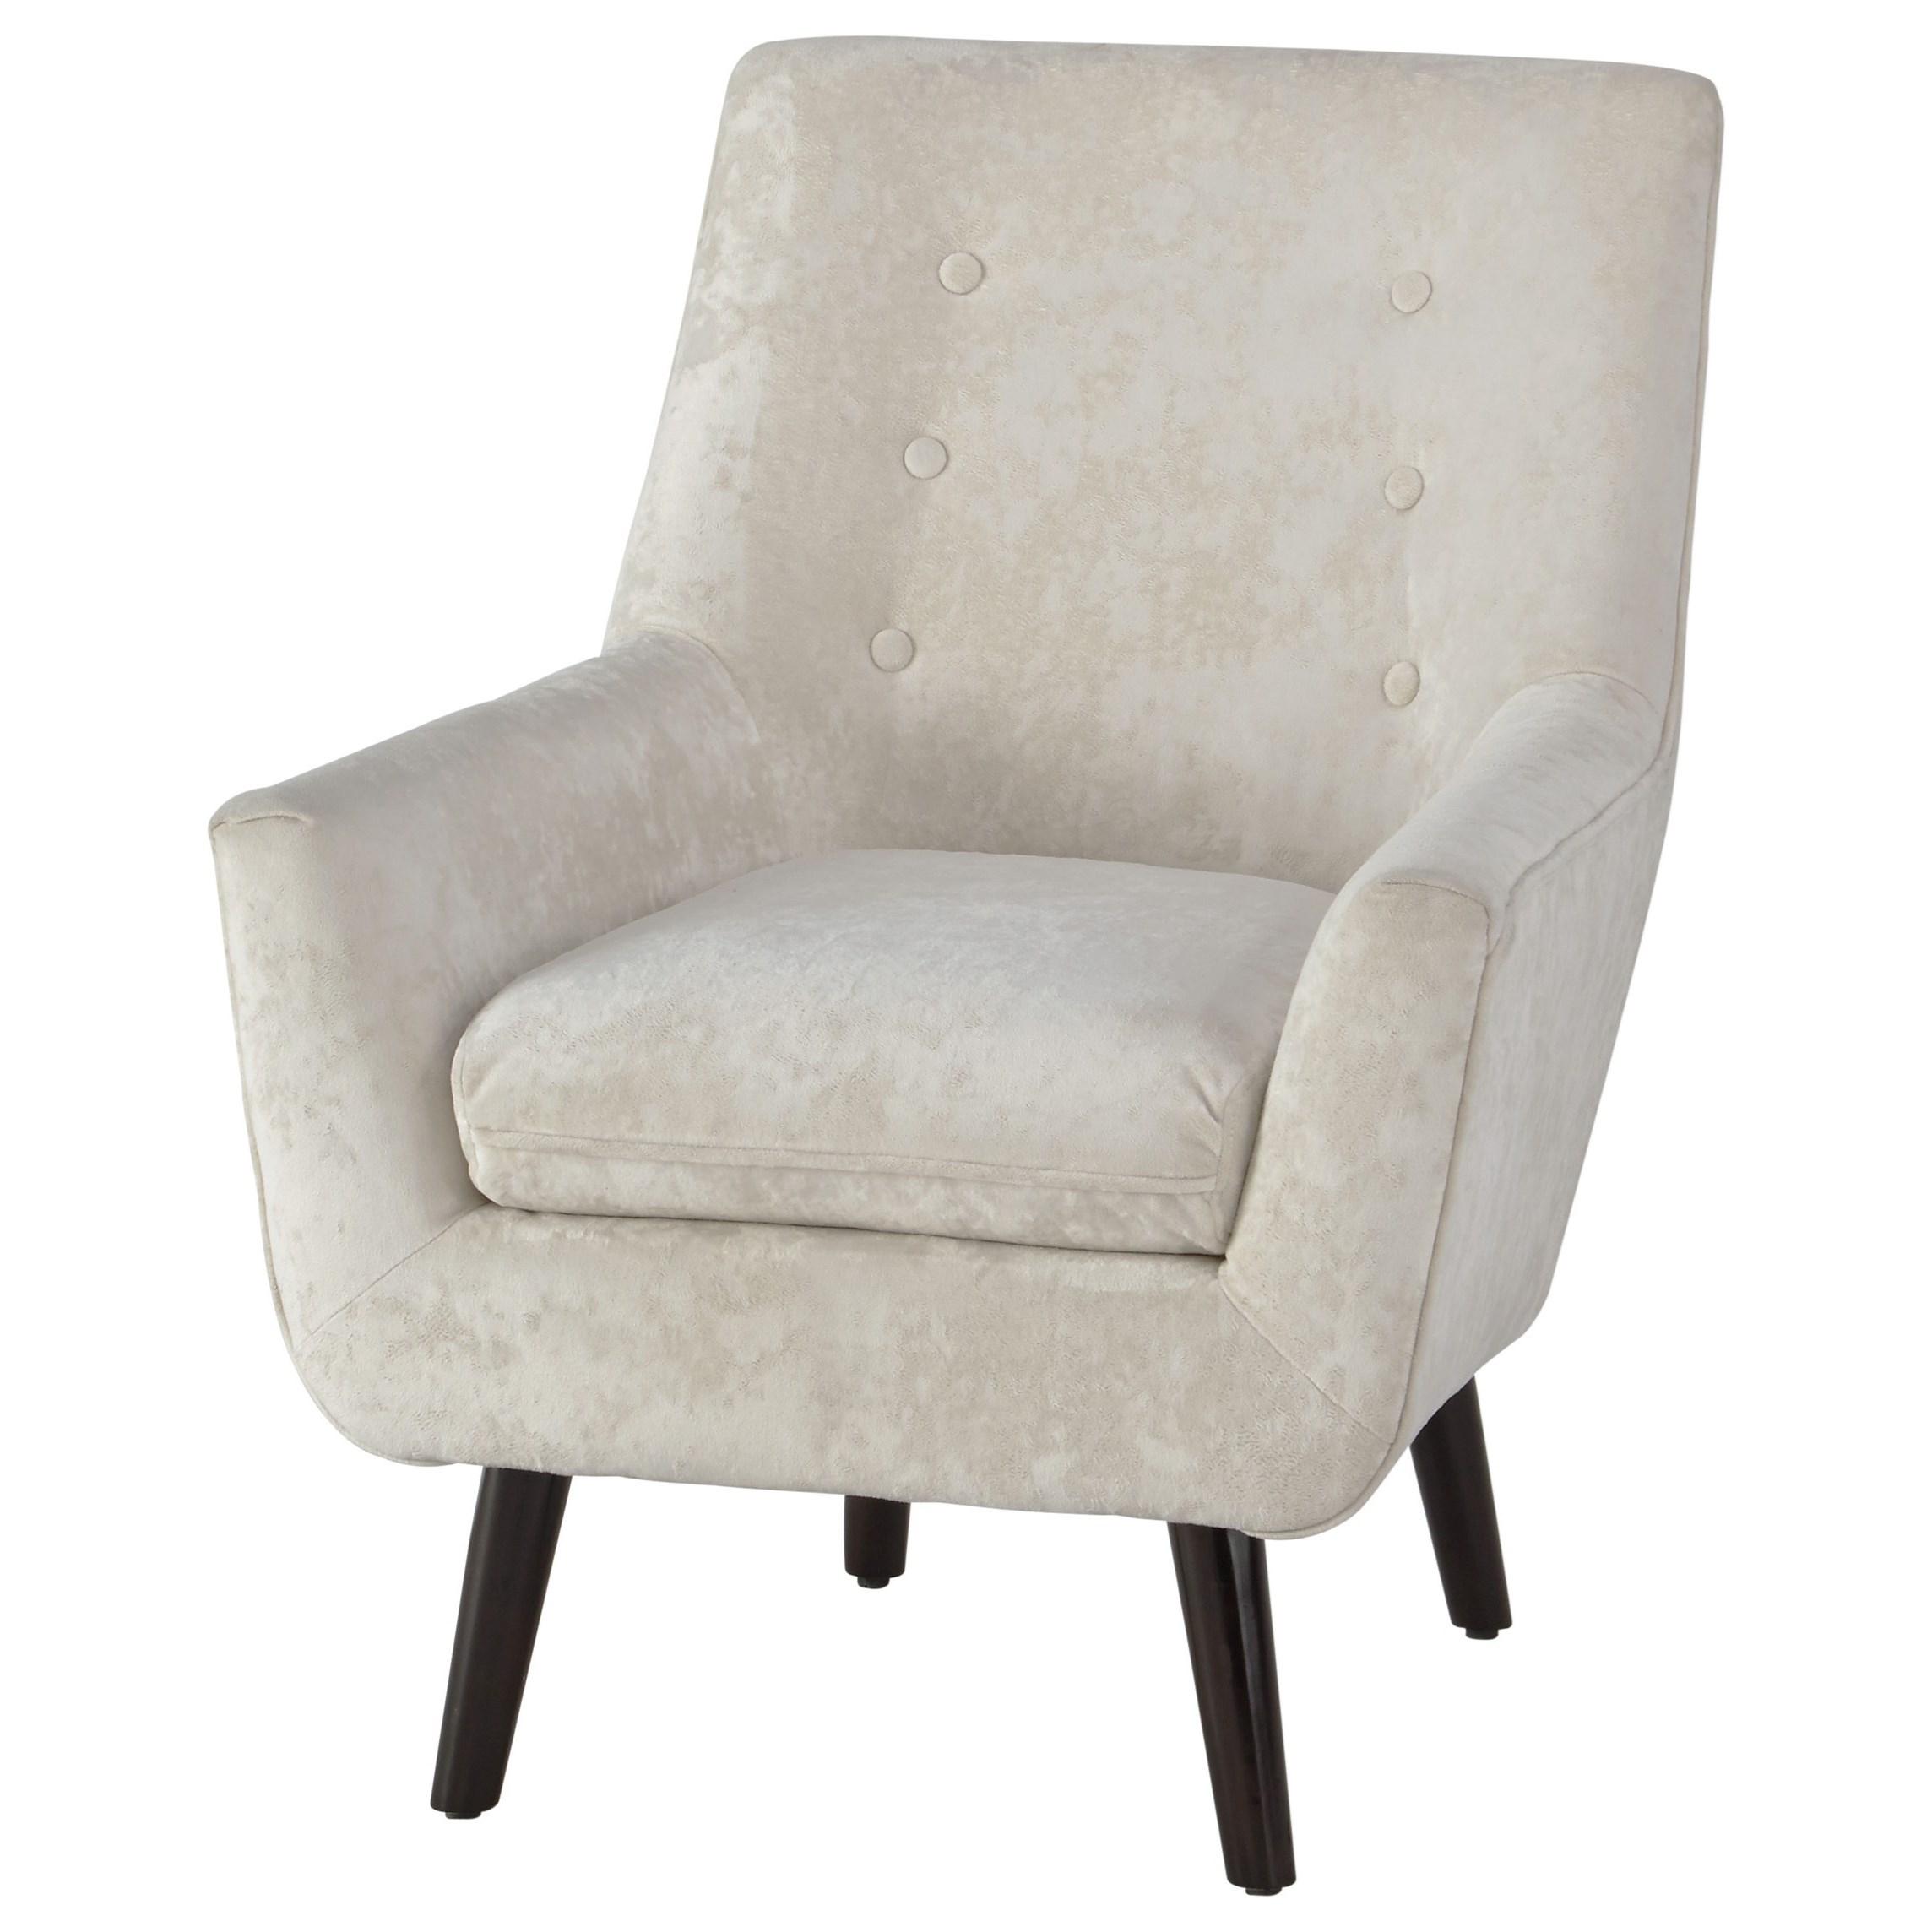 signature design by ashley zossen mid century modern. Black Bedroom Furniture Sets. Home Design Ideas